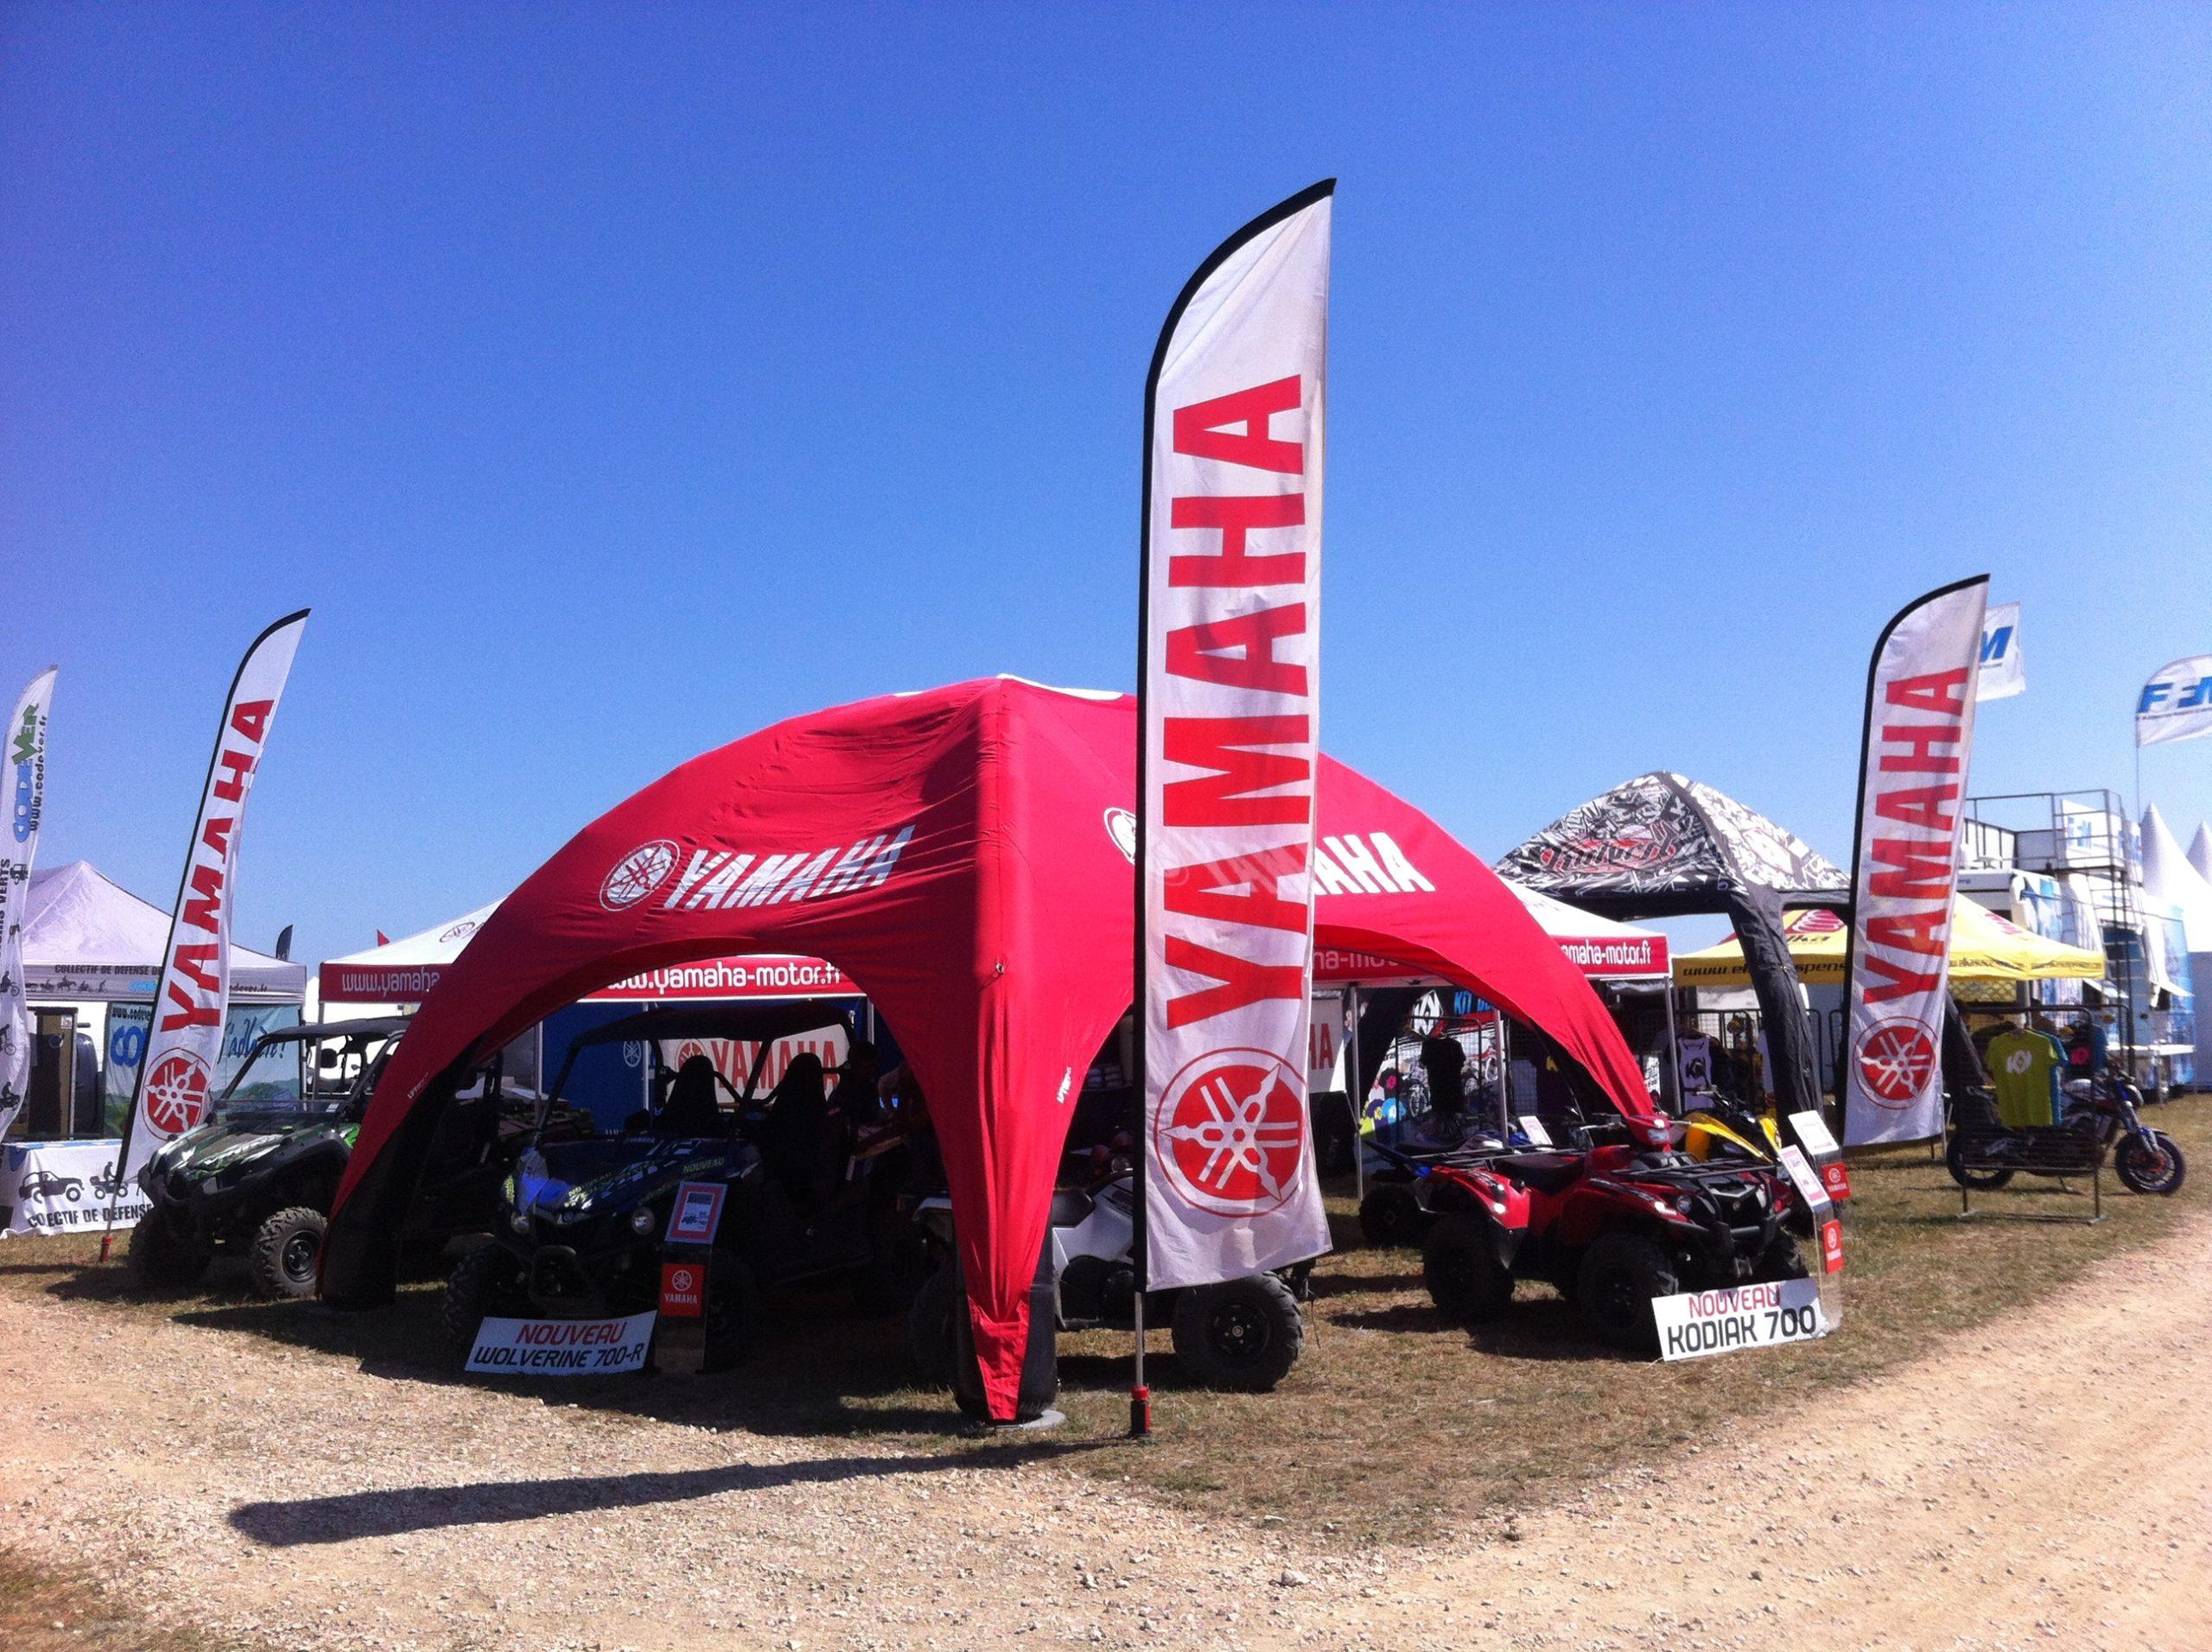 Airtent - LPTent Airmonster aufblasbares Zelt yamaha